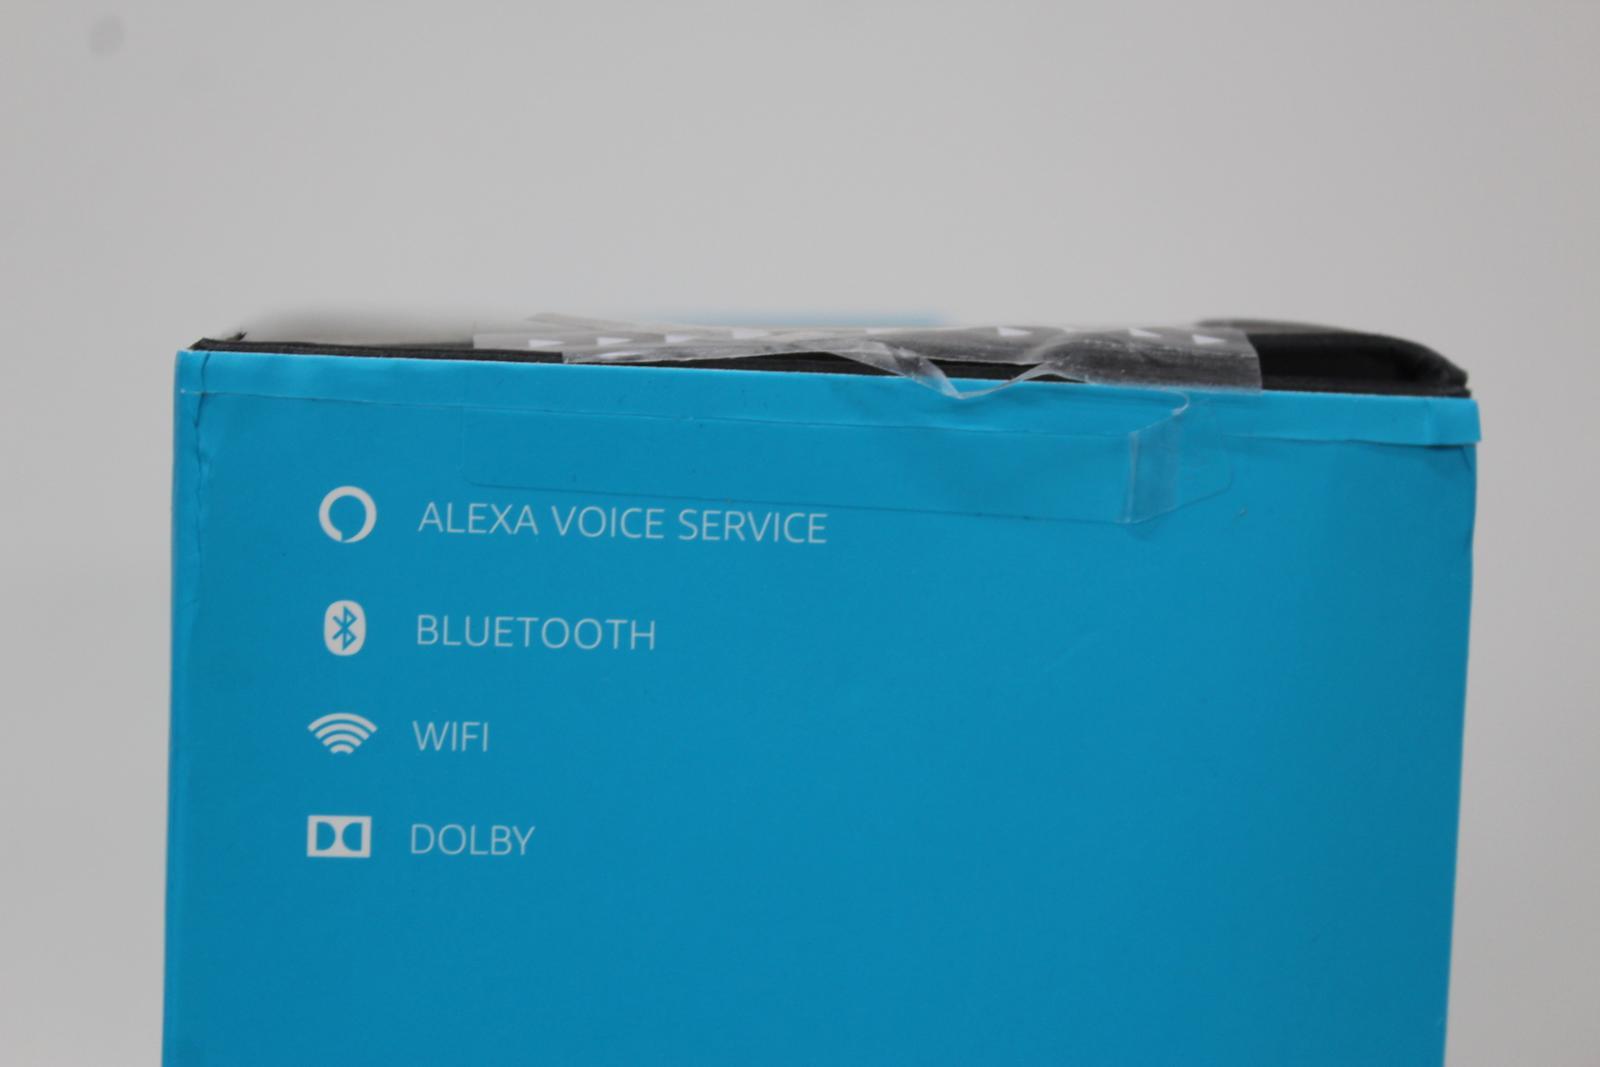 AMAZON-Echo-Show-Alexa-Smart-Assistant-Black-1st-Generation-7-034-Display-NEW thumbnail 9